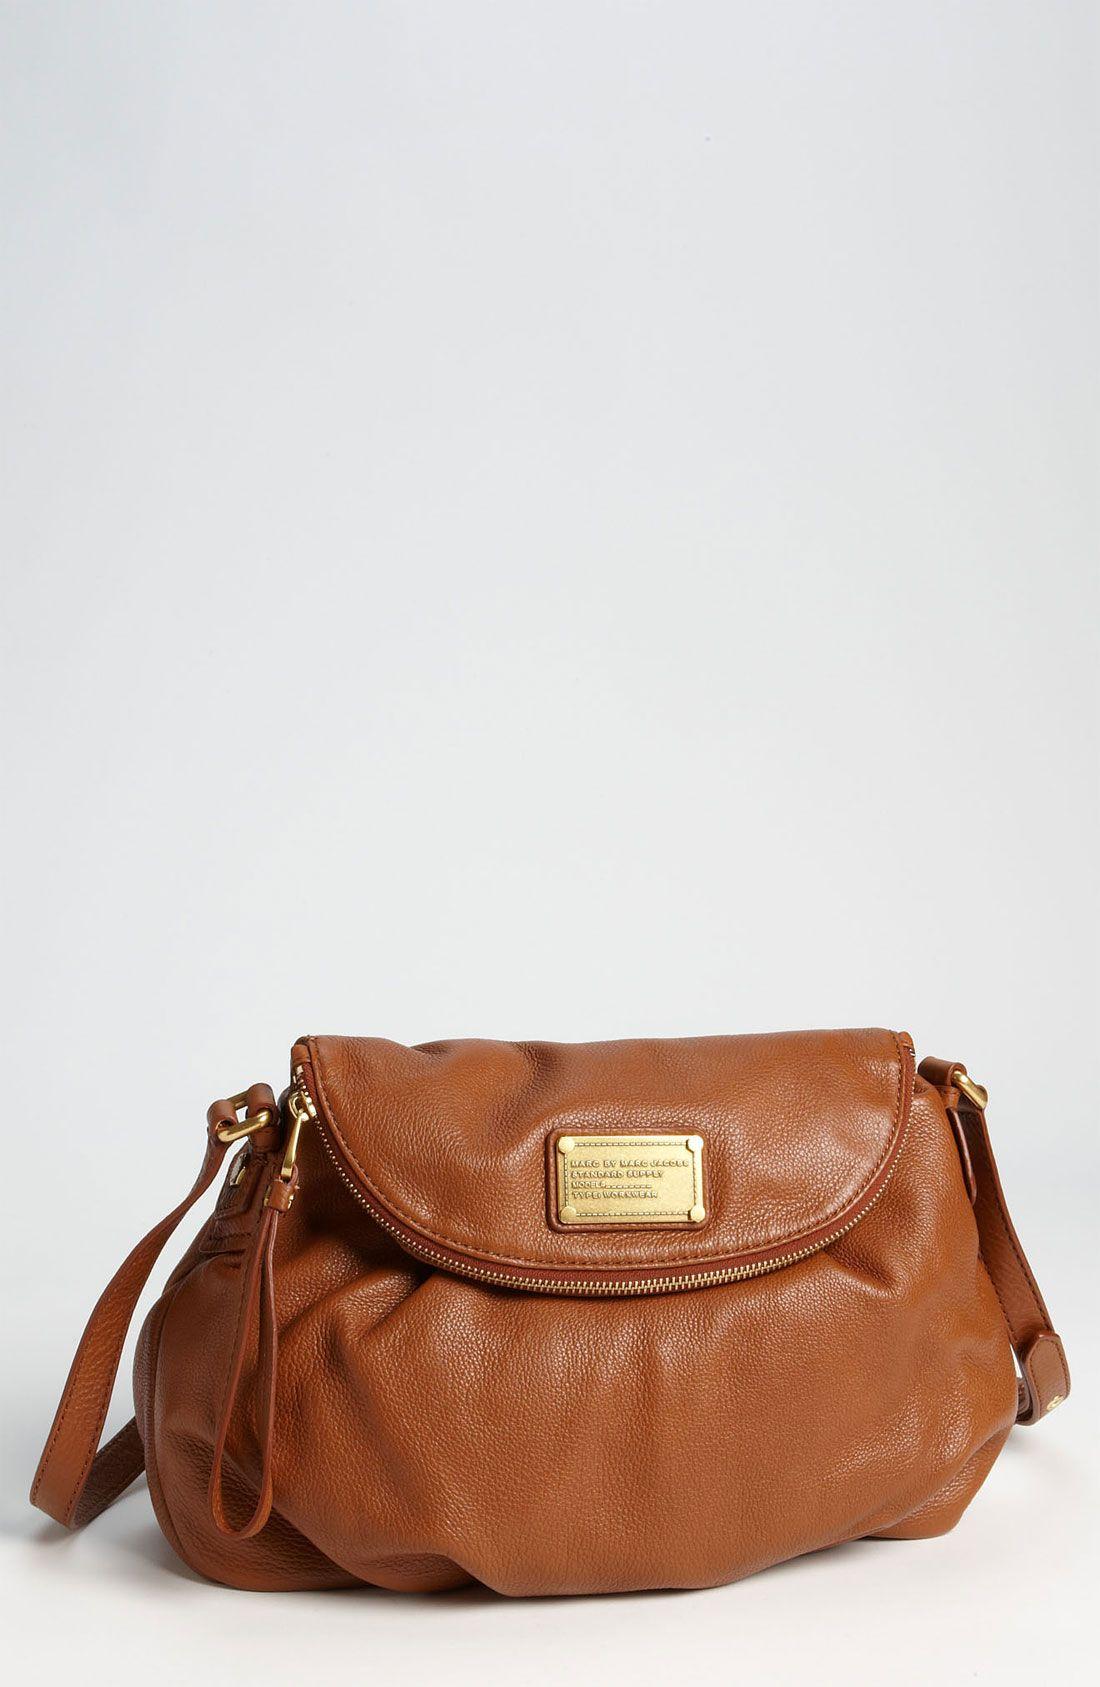 3c9f6c51a2f5a Marc By Marc Jacobs Classic Q Natasha Crossbody Flap Bag in Brown (cinnamon  stick)